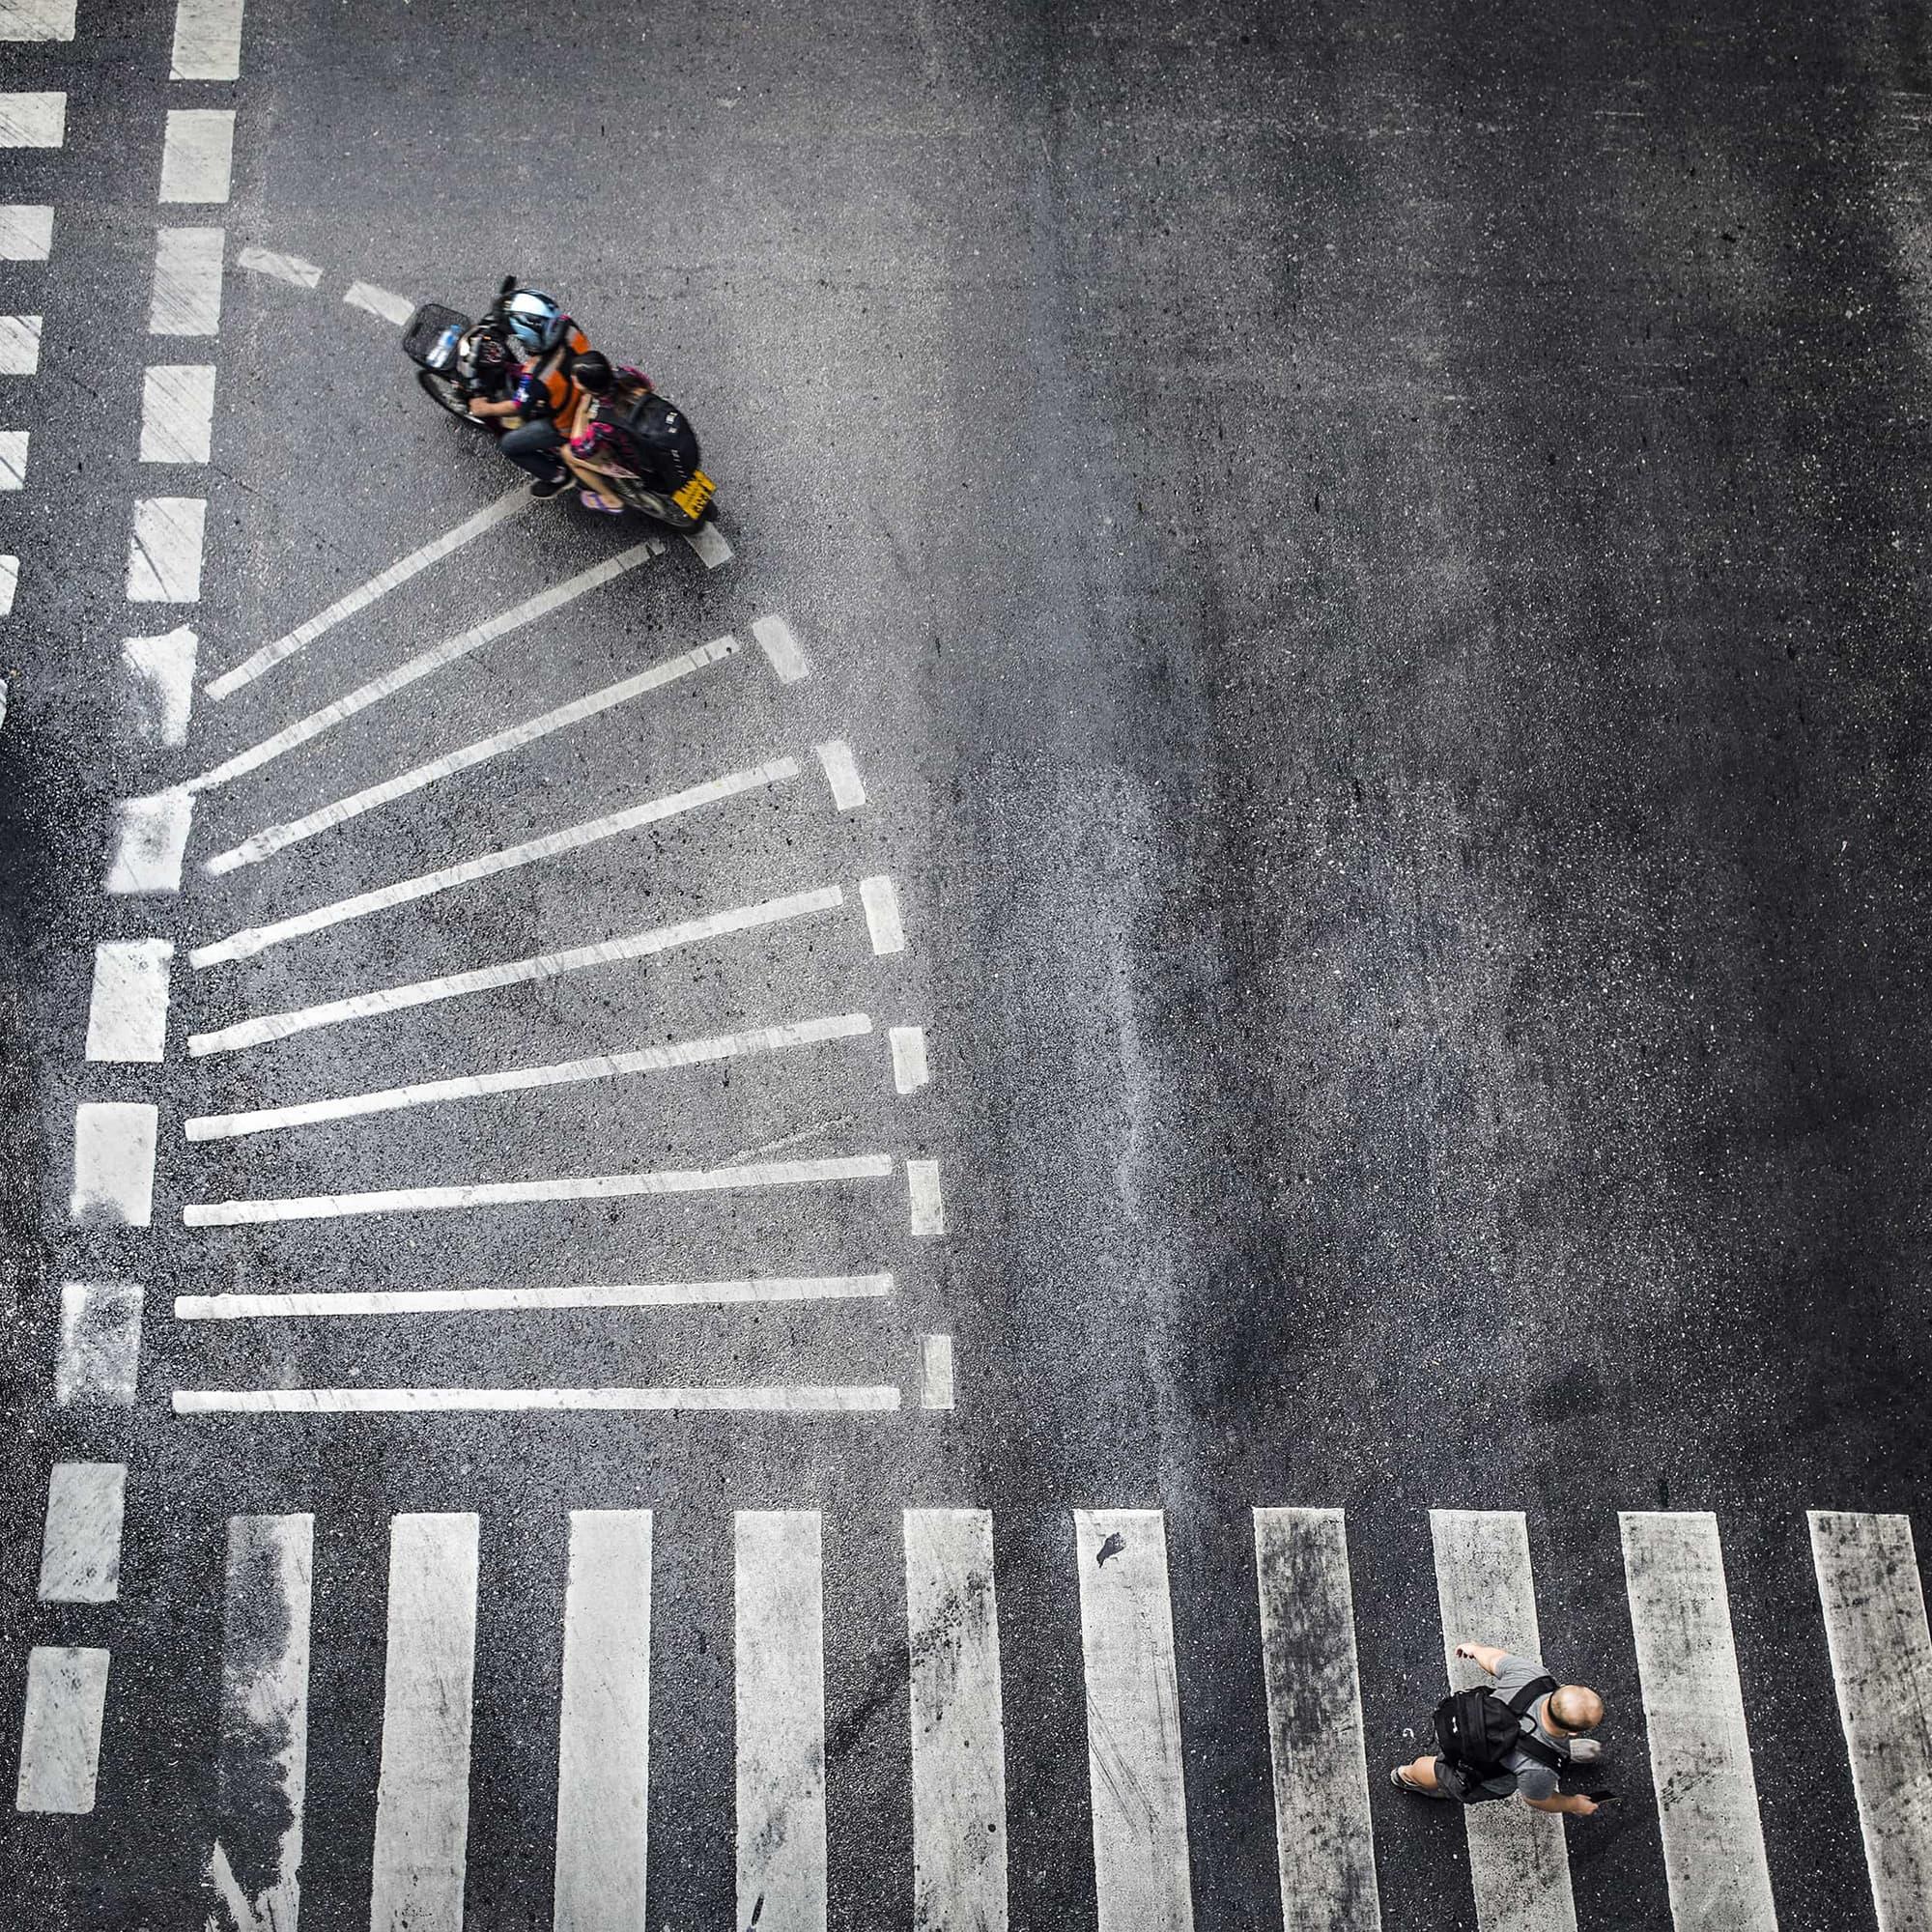 street-documentary-photography-fabio-burrelli-9.jpg